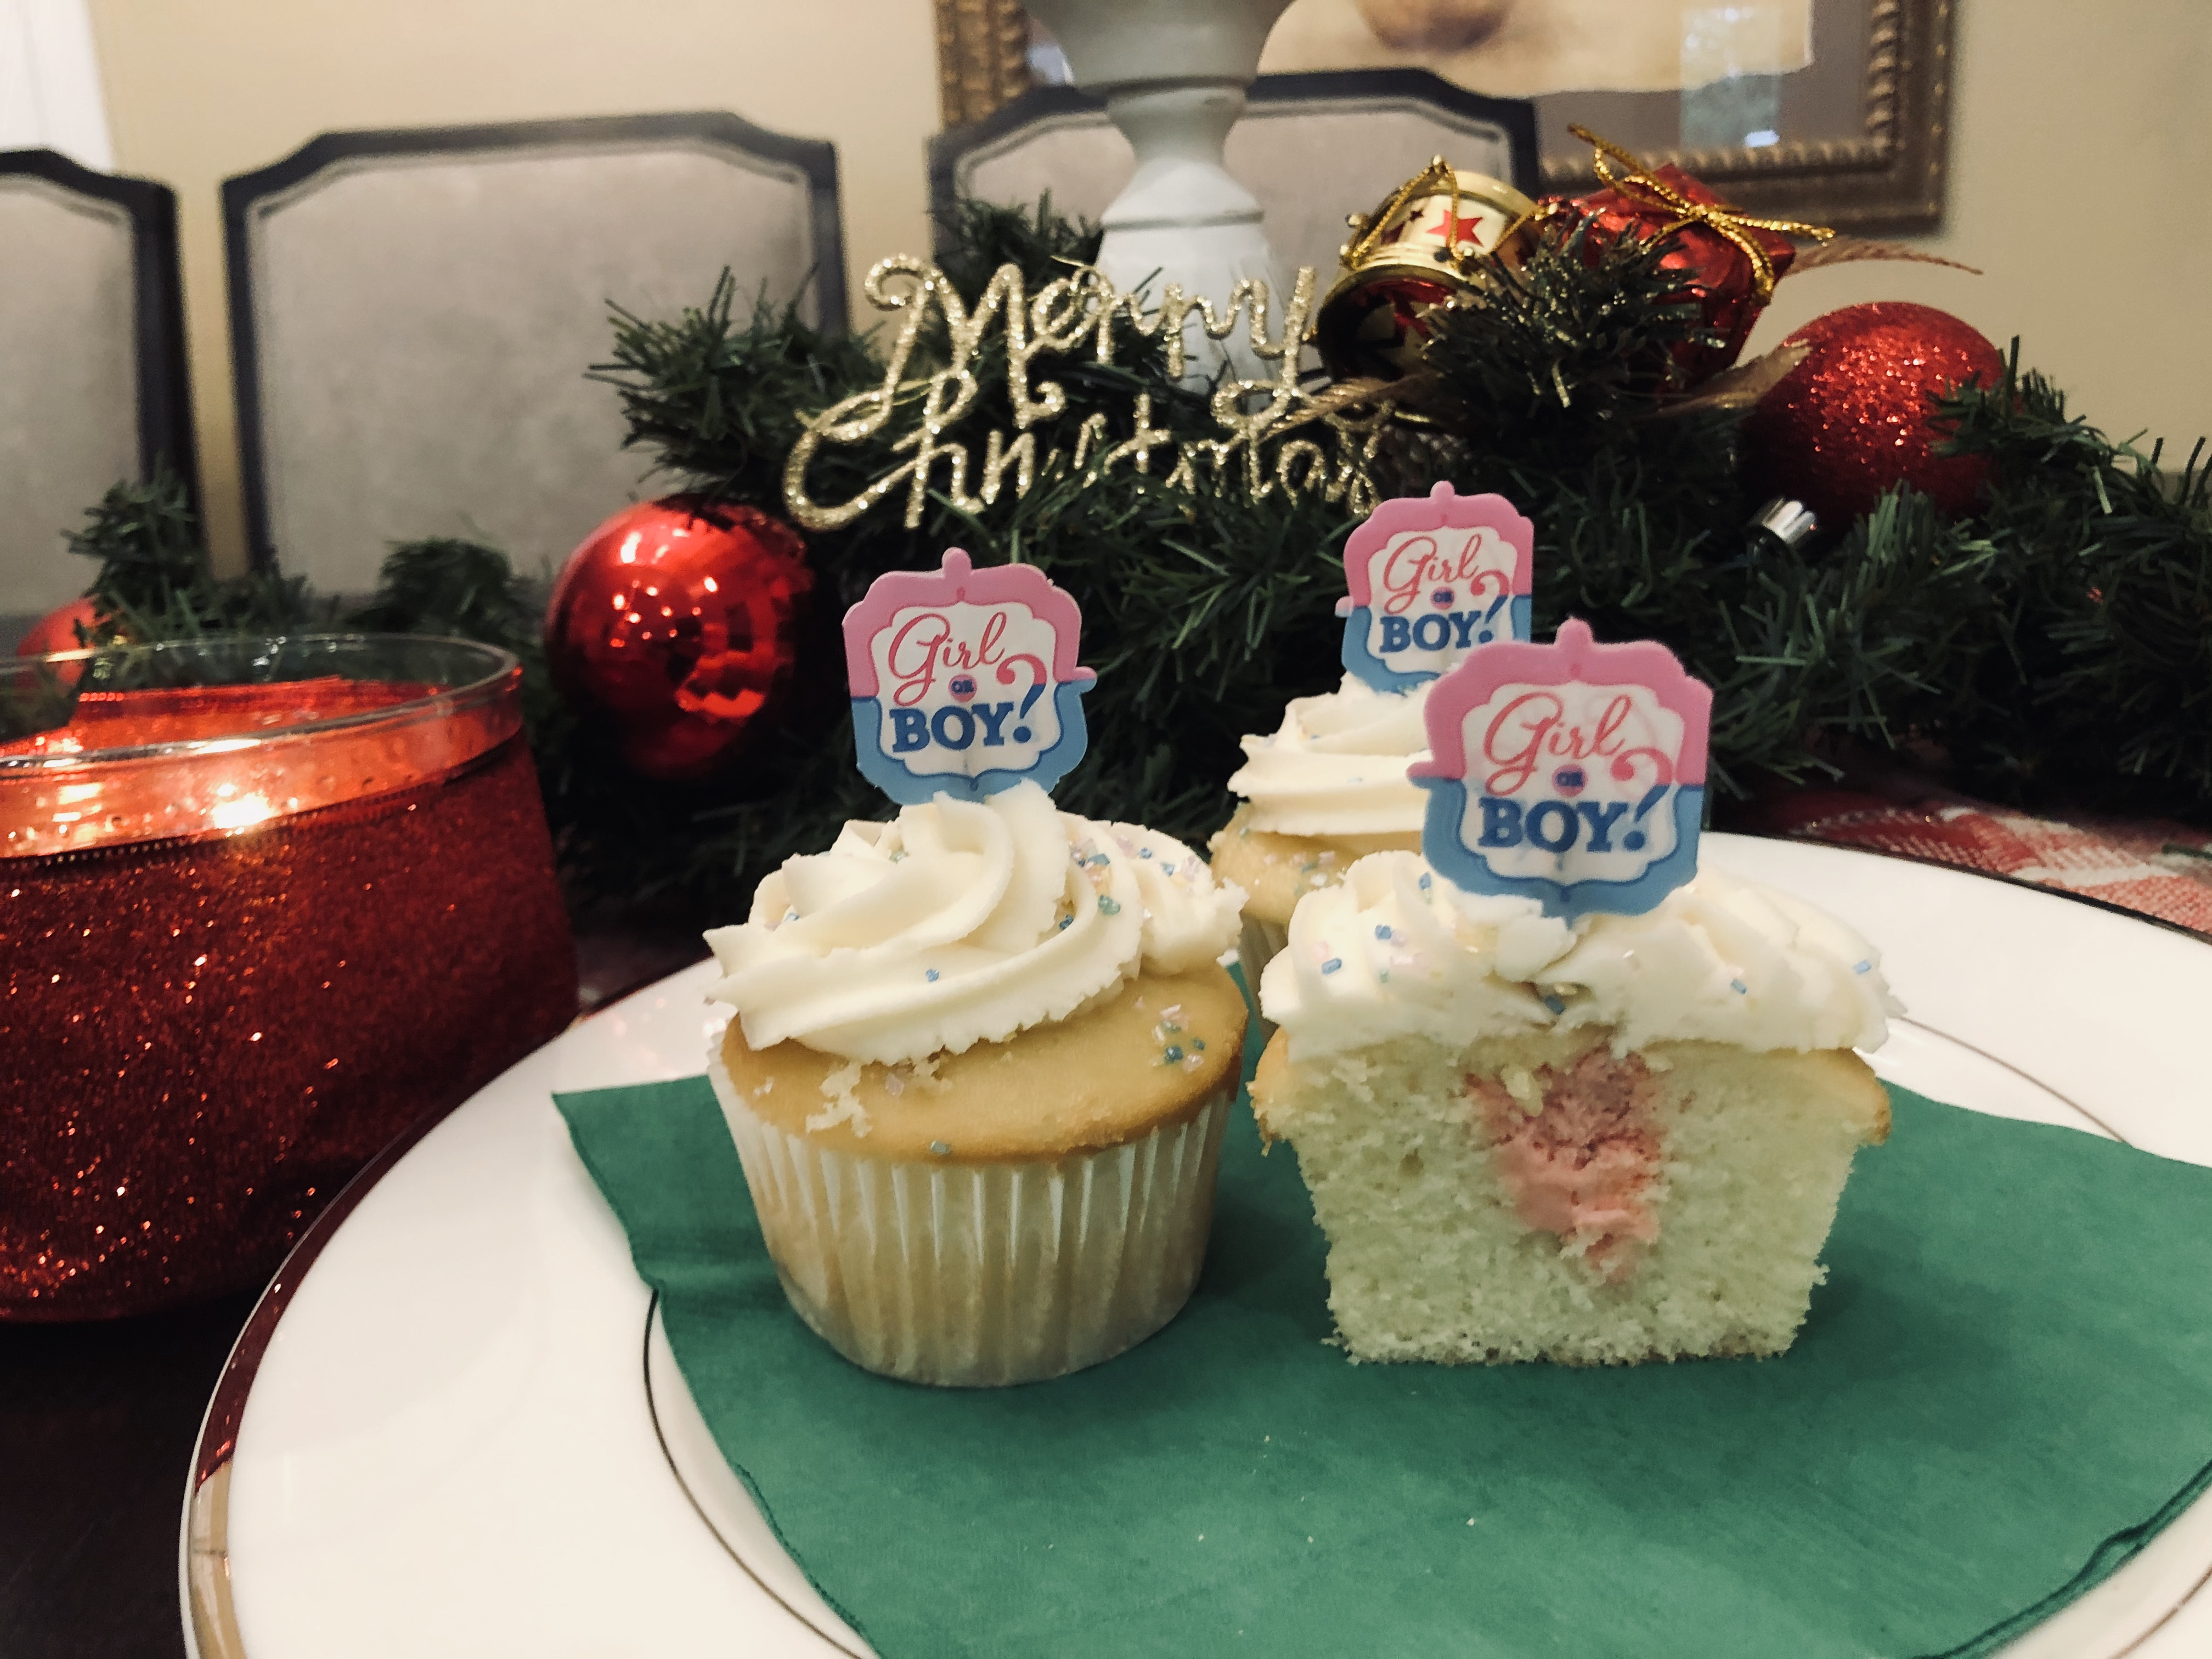 Best Gender Reveal Cupcakes Ever!